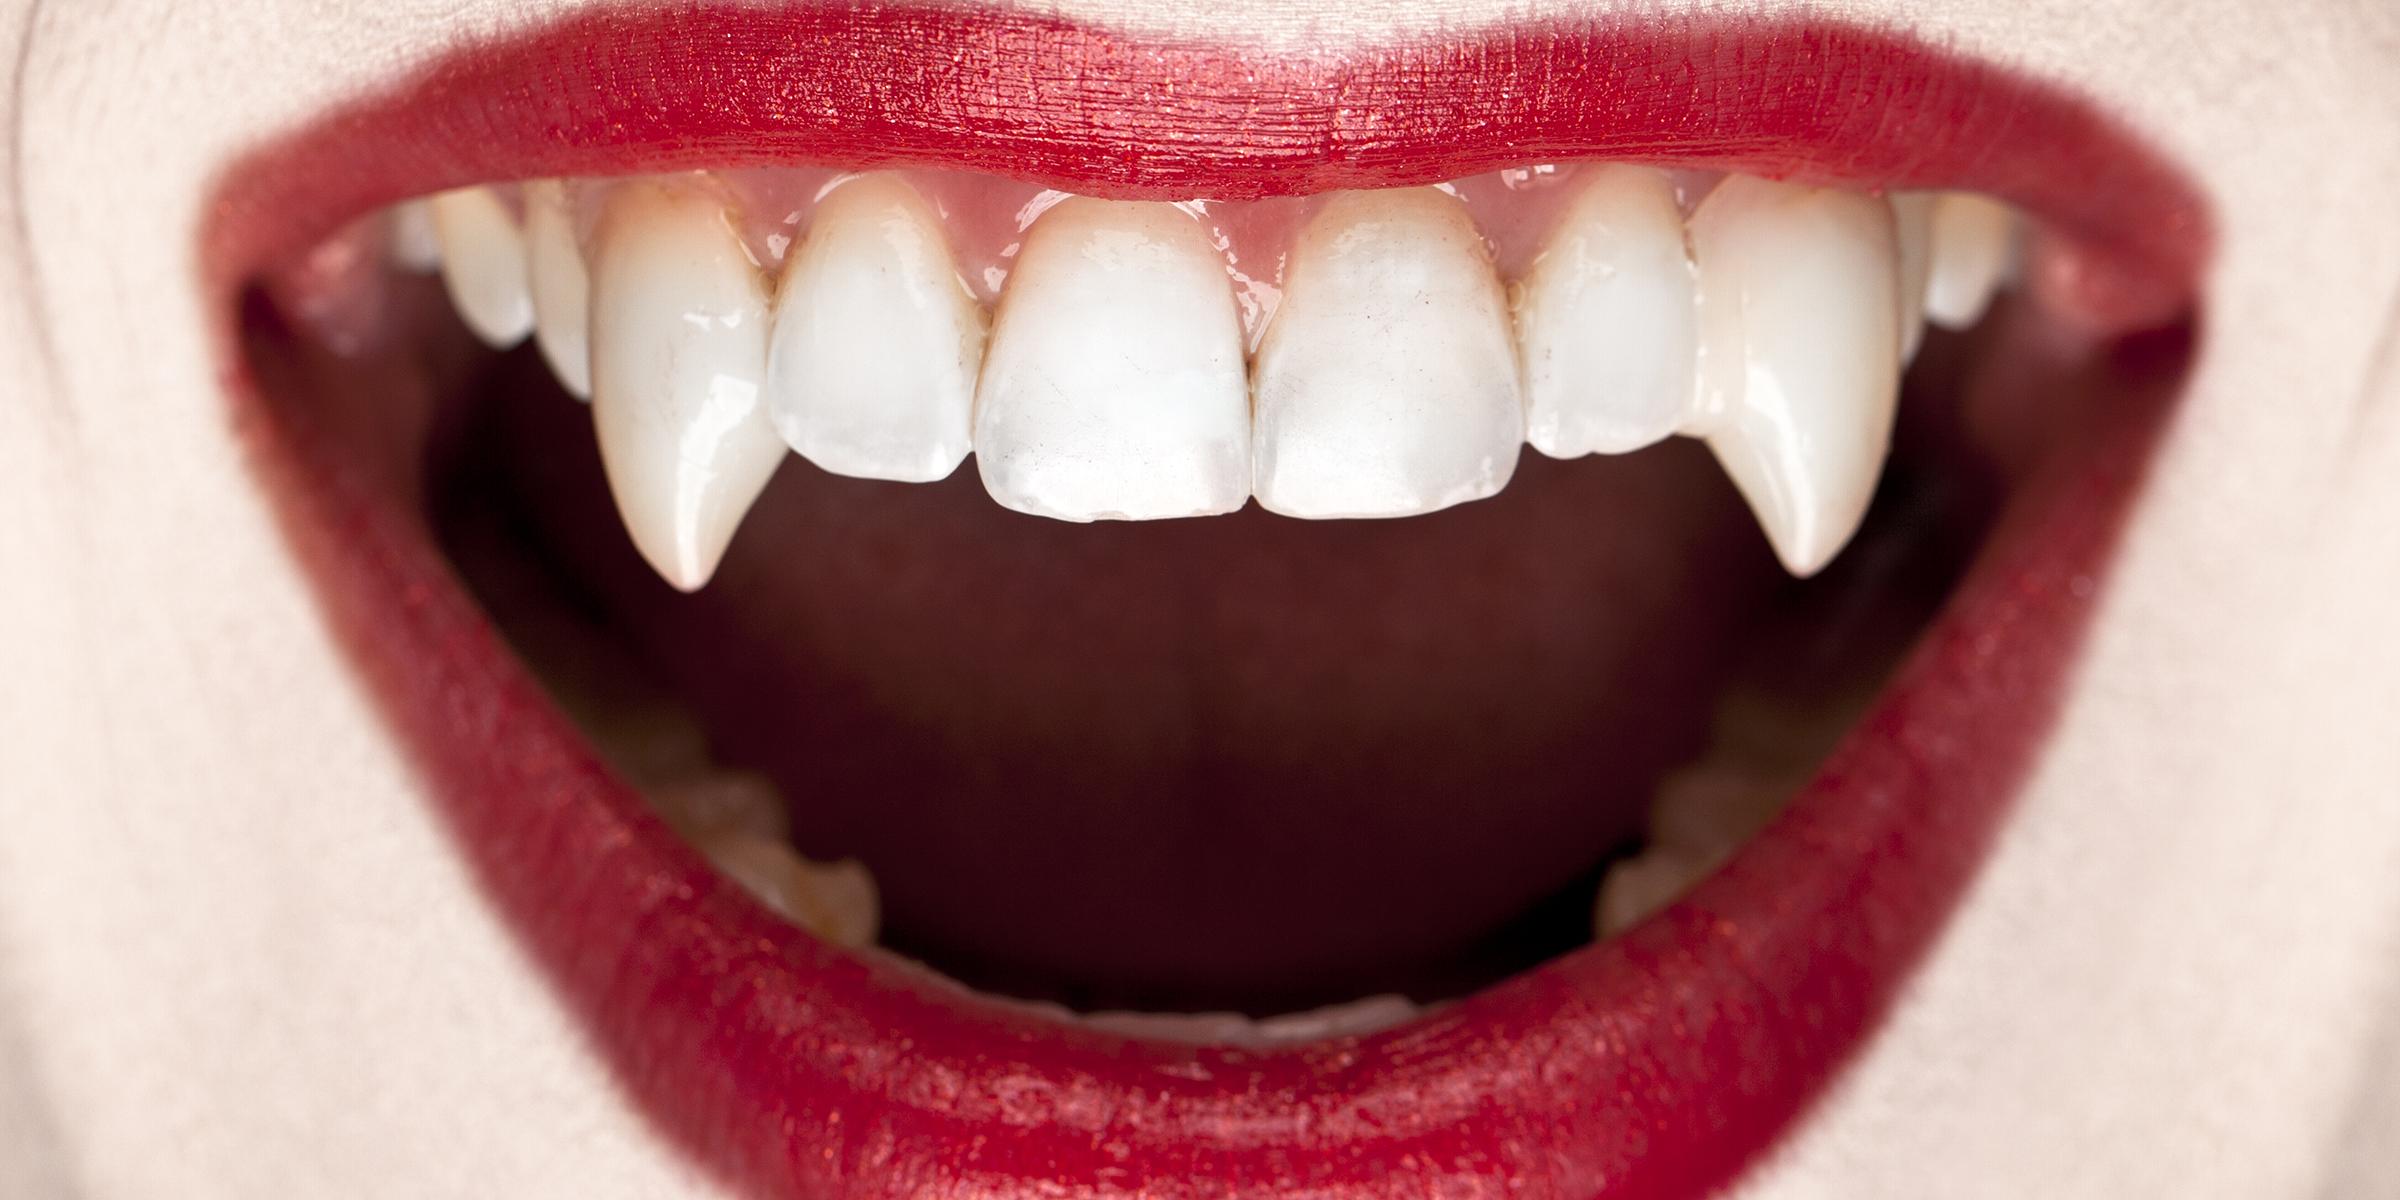 Woman's Halloween teeth get stuck, become dental emergency